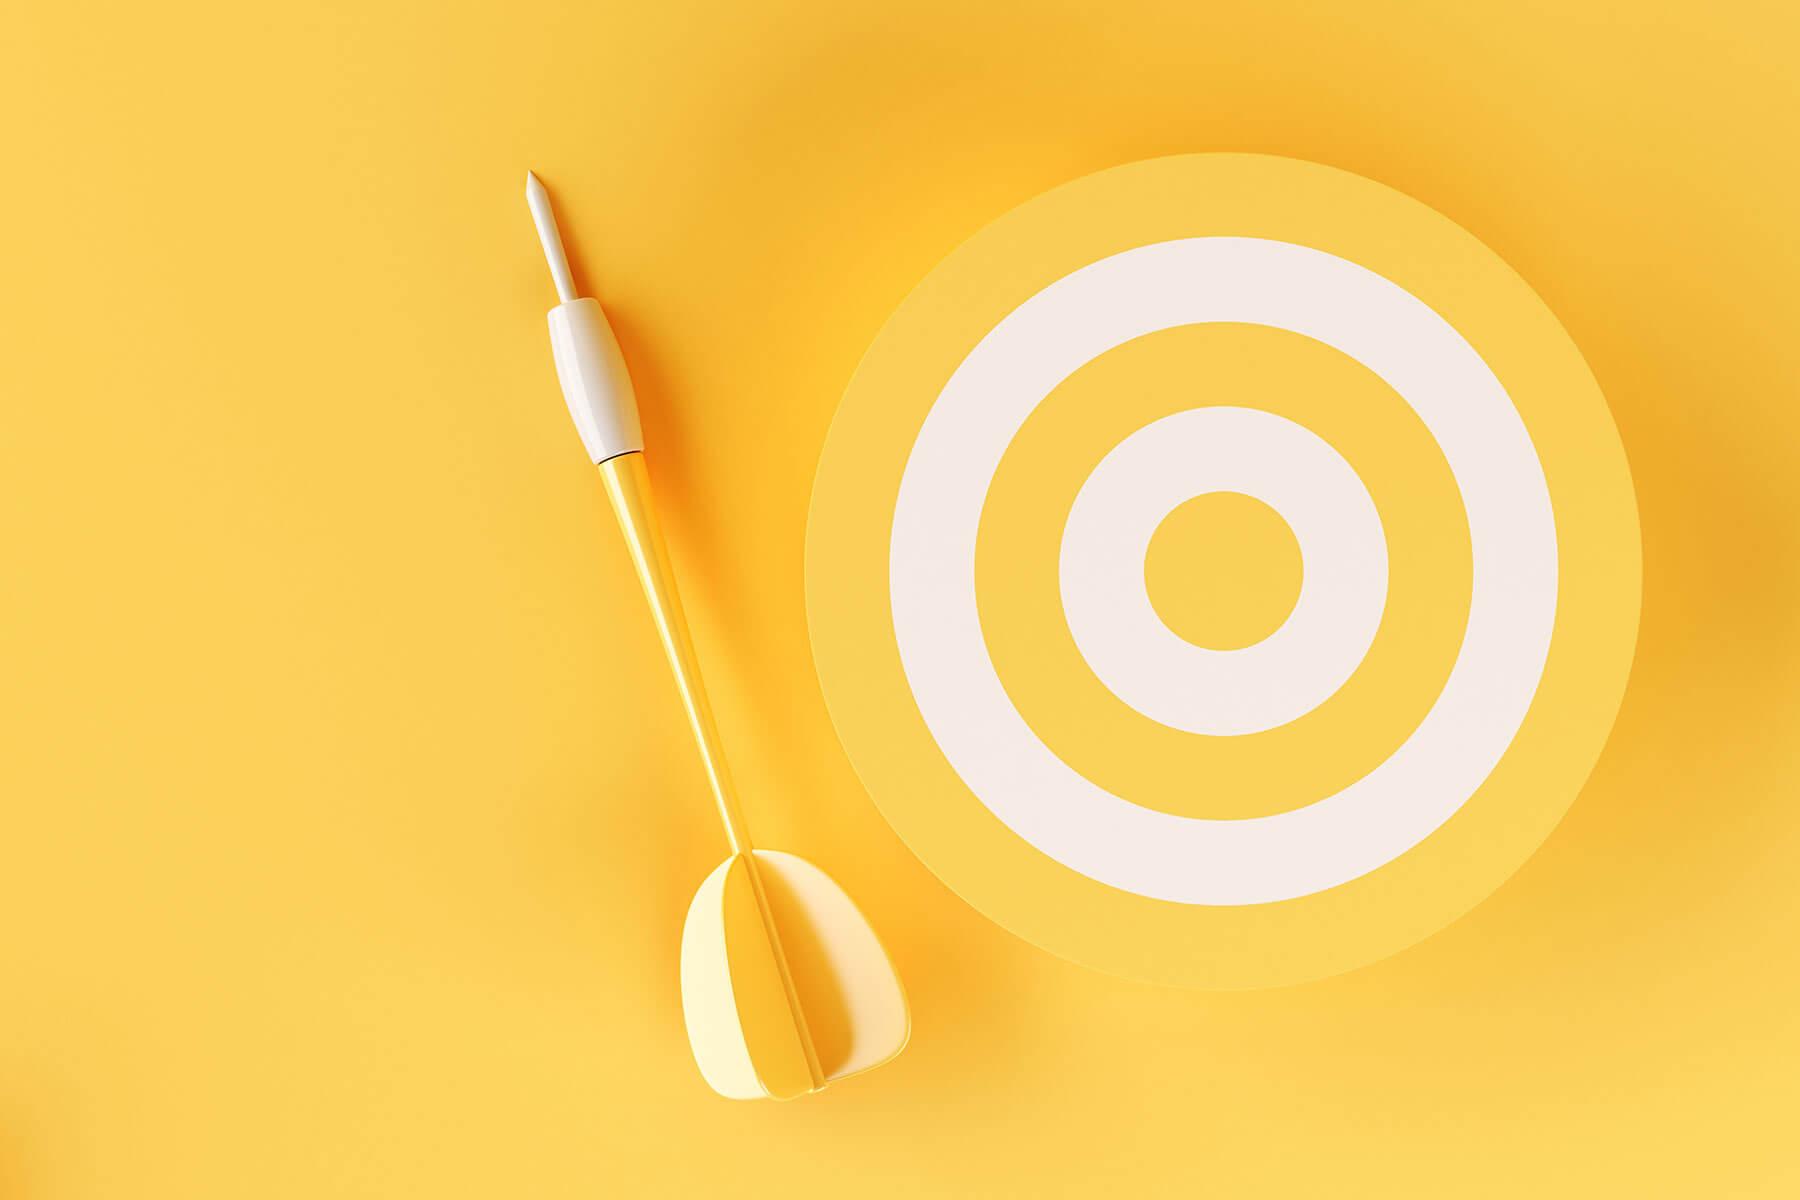 3d-target-on-yellow-background-TKEE3CQ.jpg